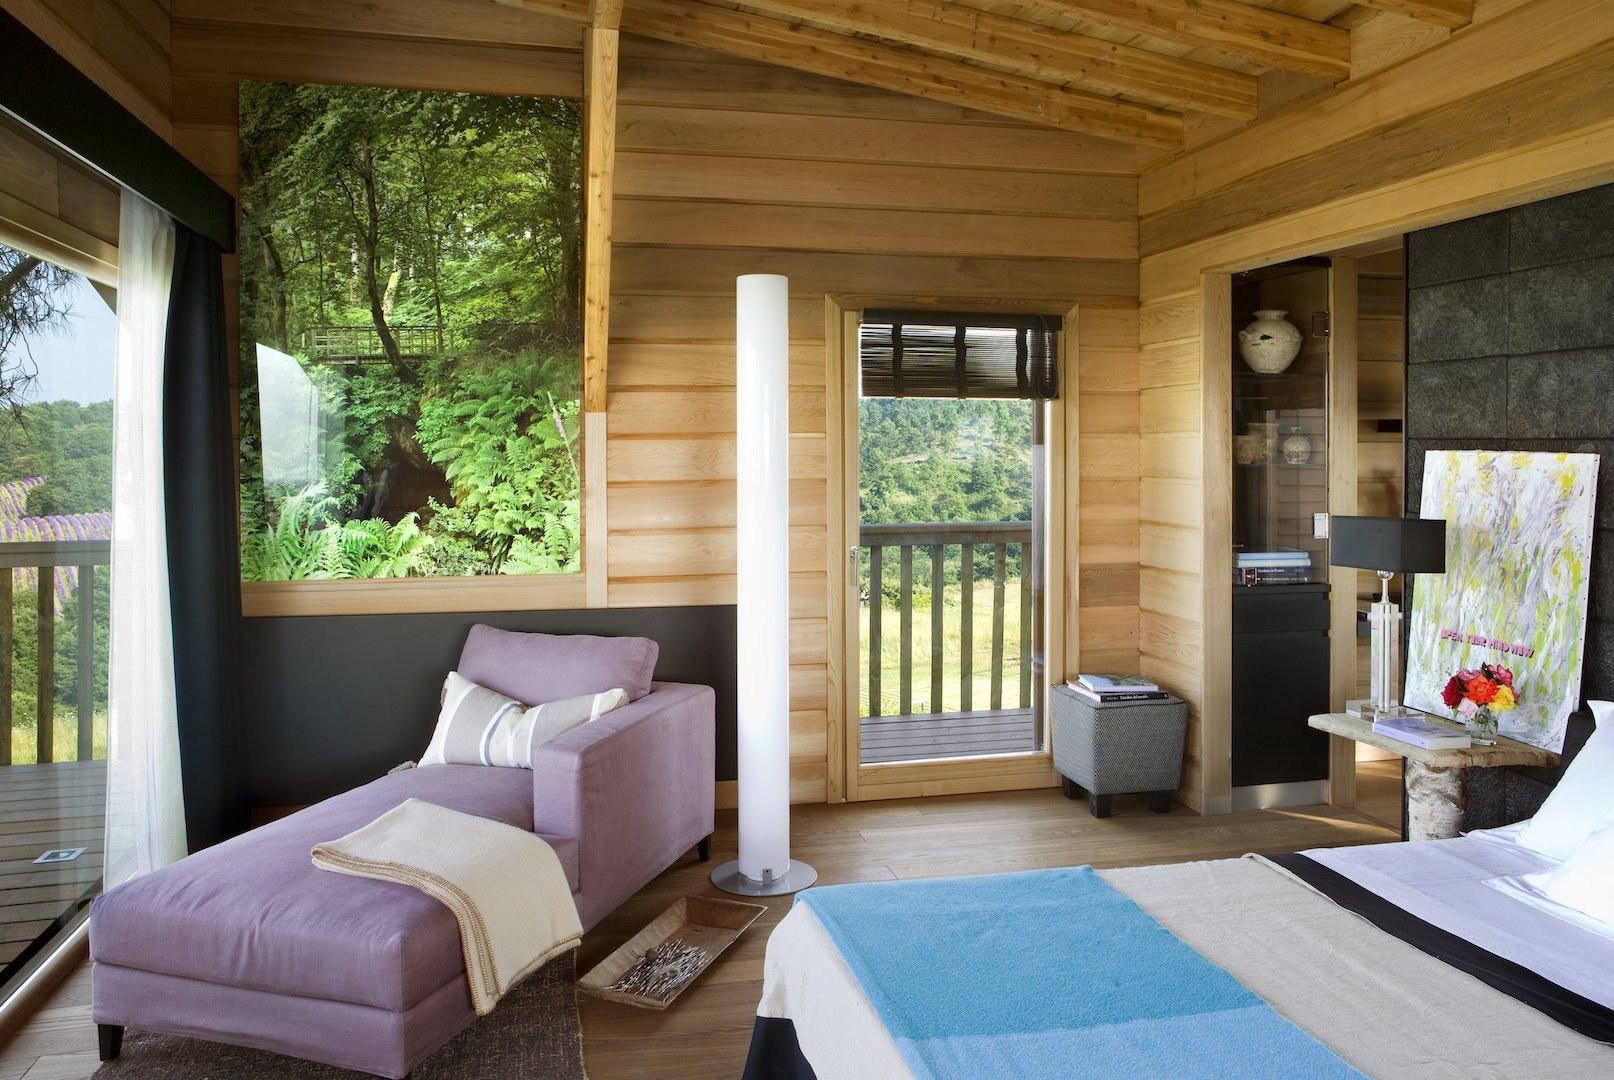 Italian Treehouse by Claudia Pelizzari Interior Design